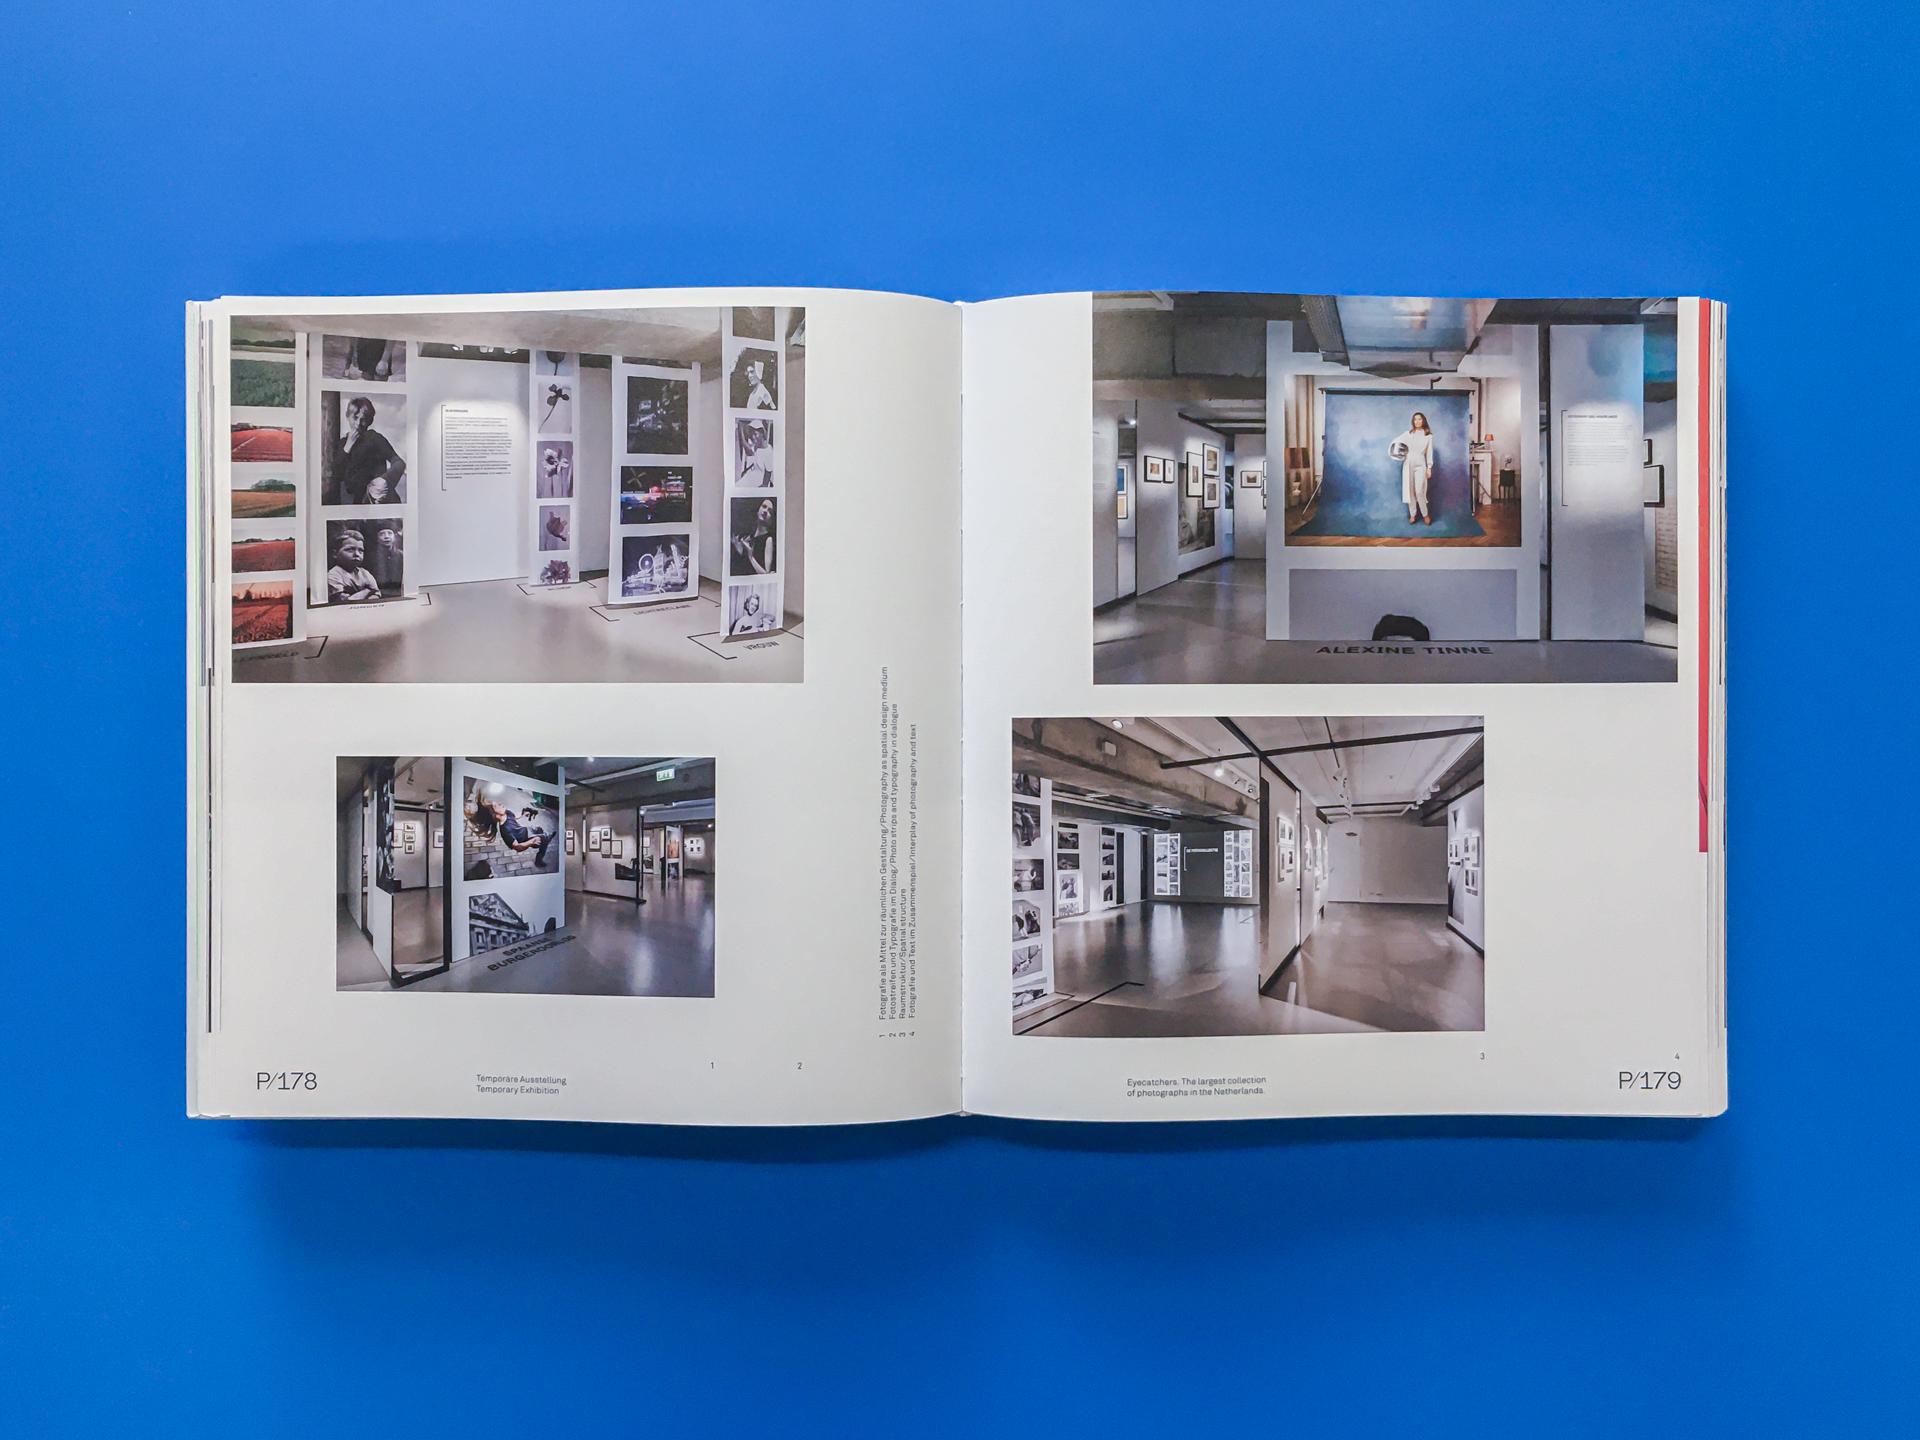 dvvd na new exhibition design 03 book 3 1 jpg